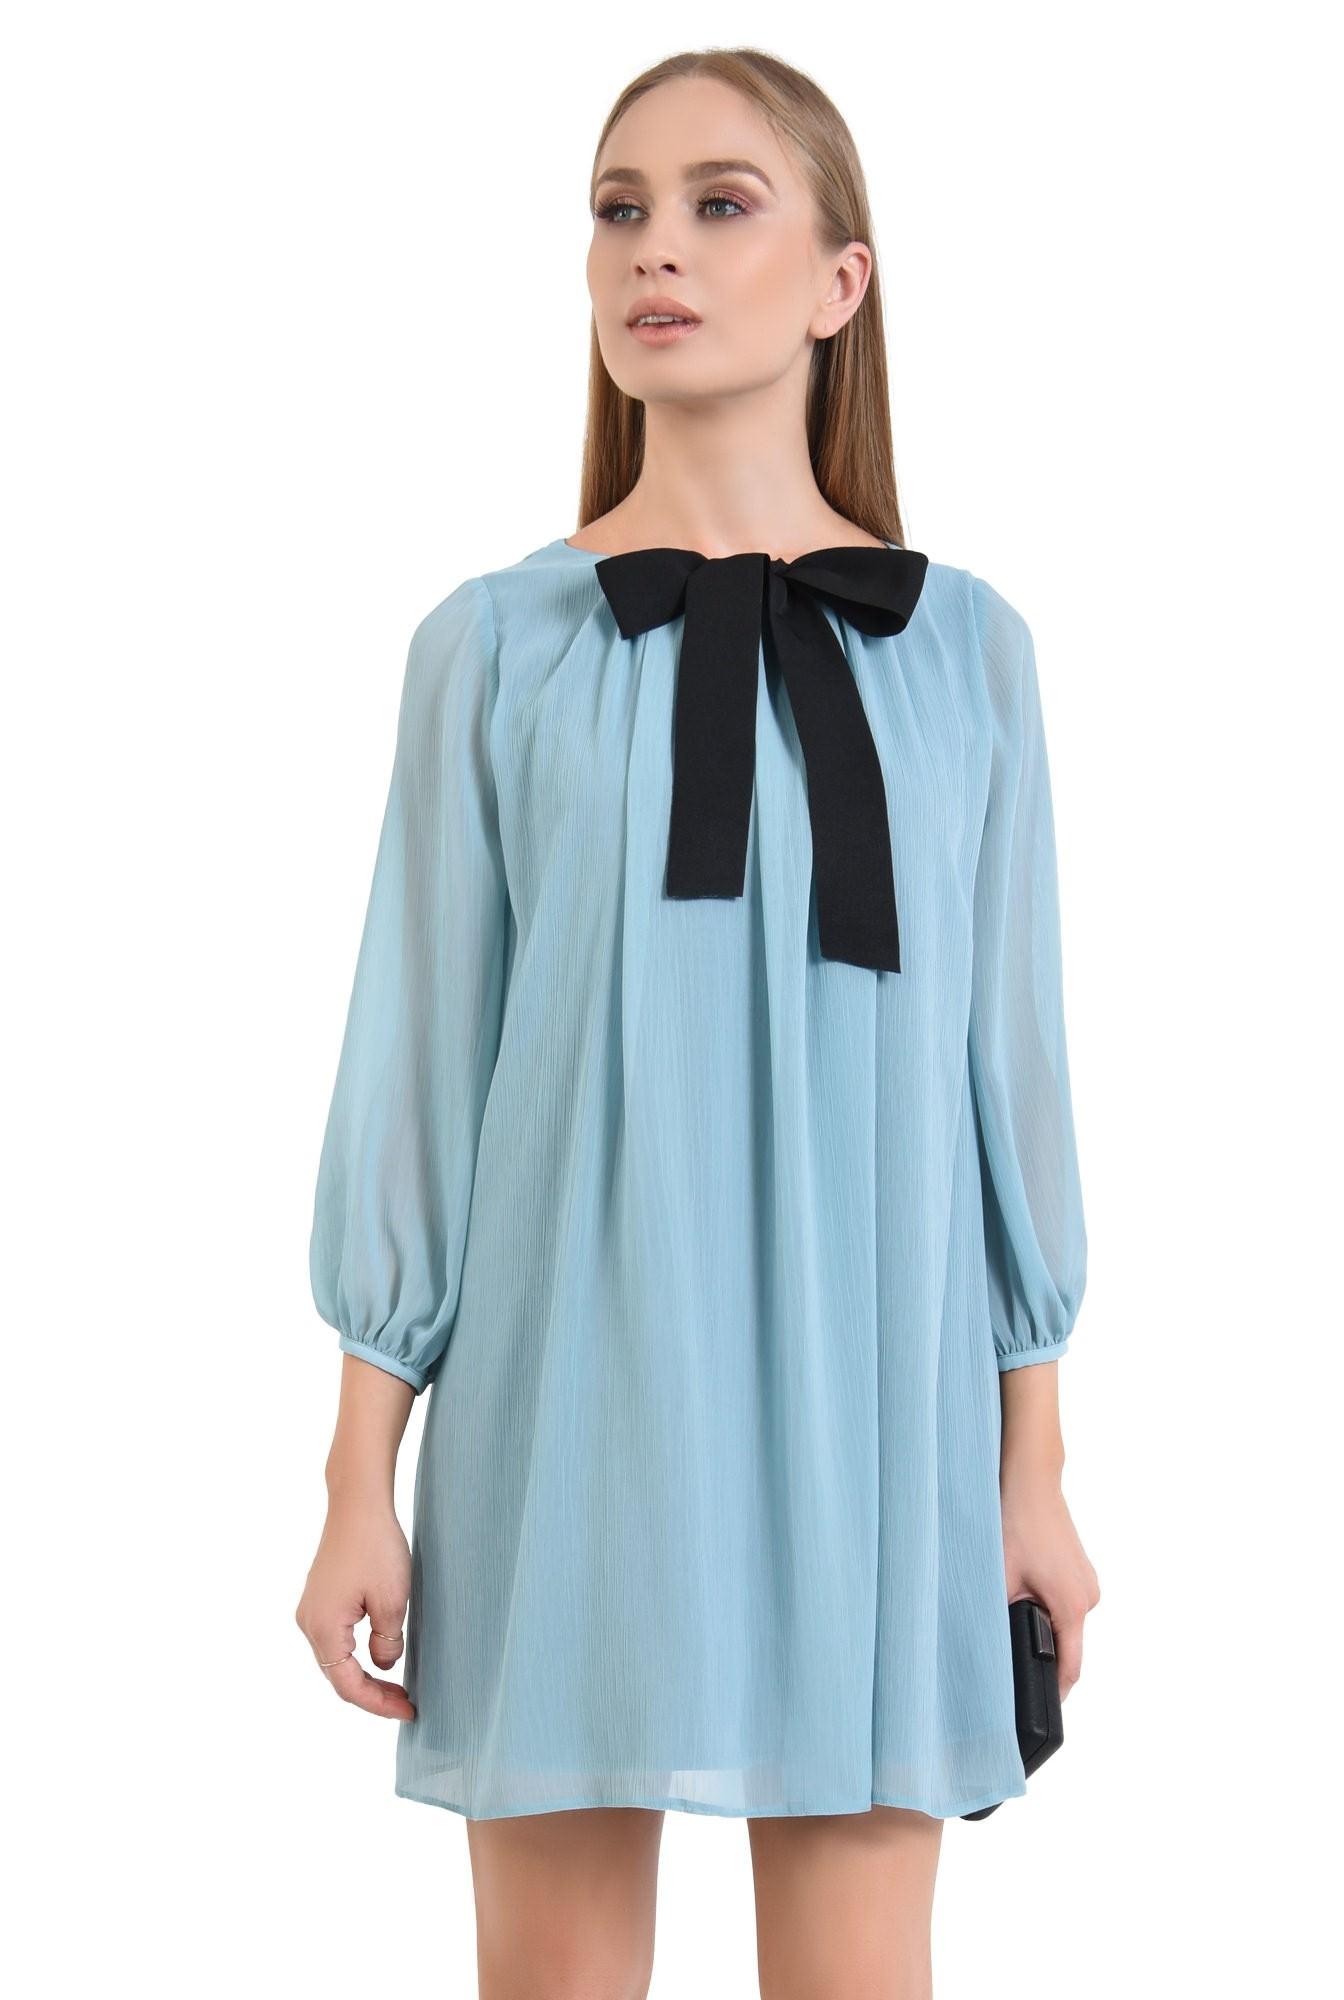 0 - rochie eleganta, bleu, rips, negru, contrast